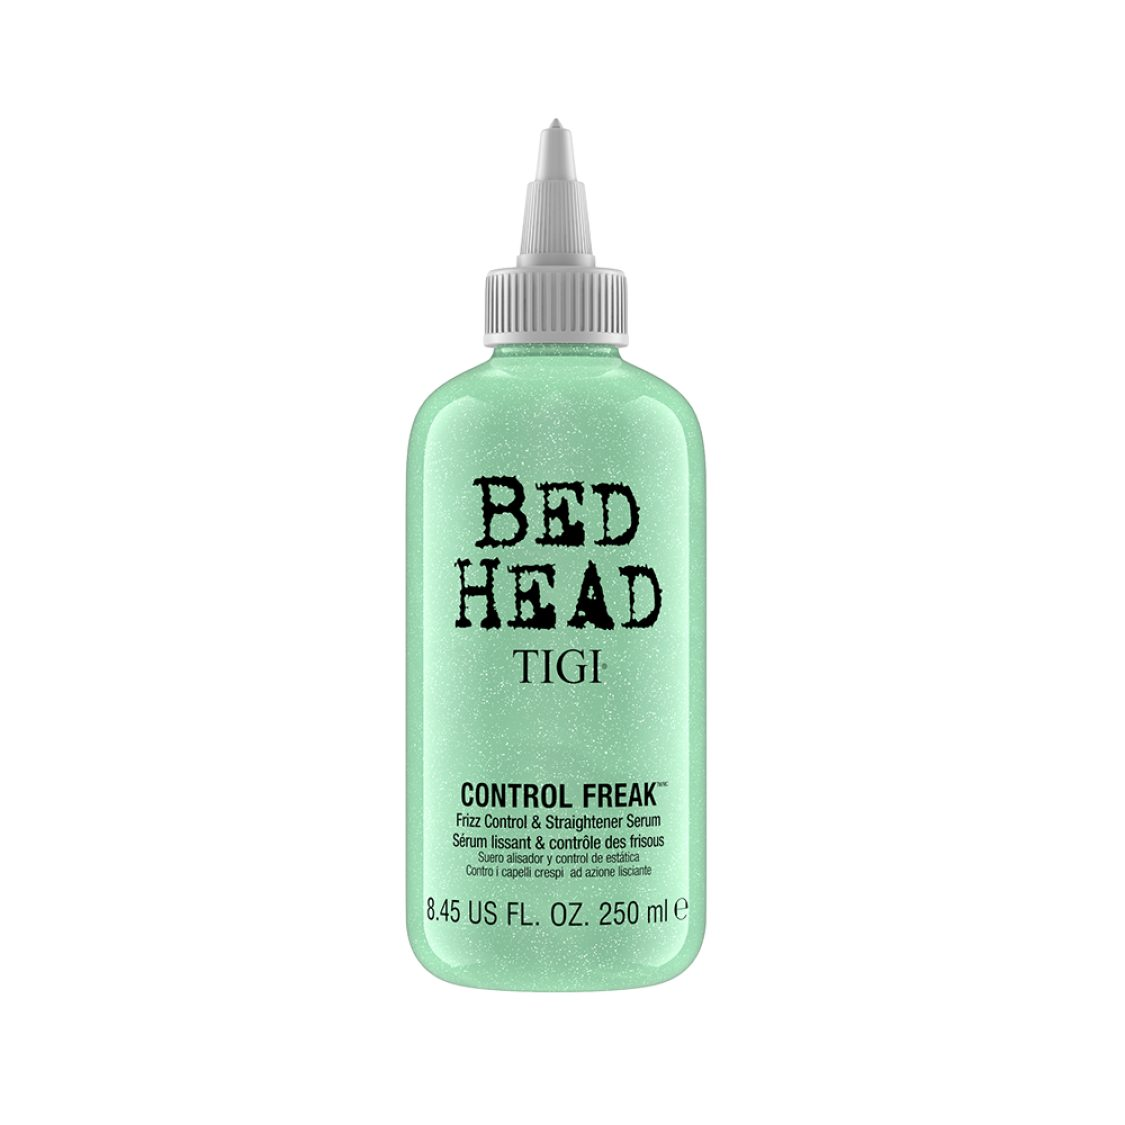 TIGI - Bed Head - Control Freak Serum 250ml